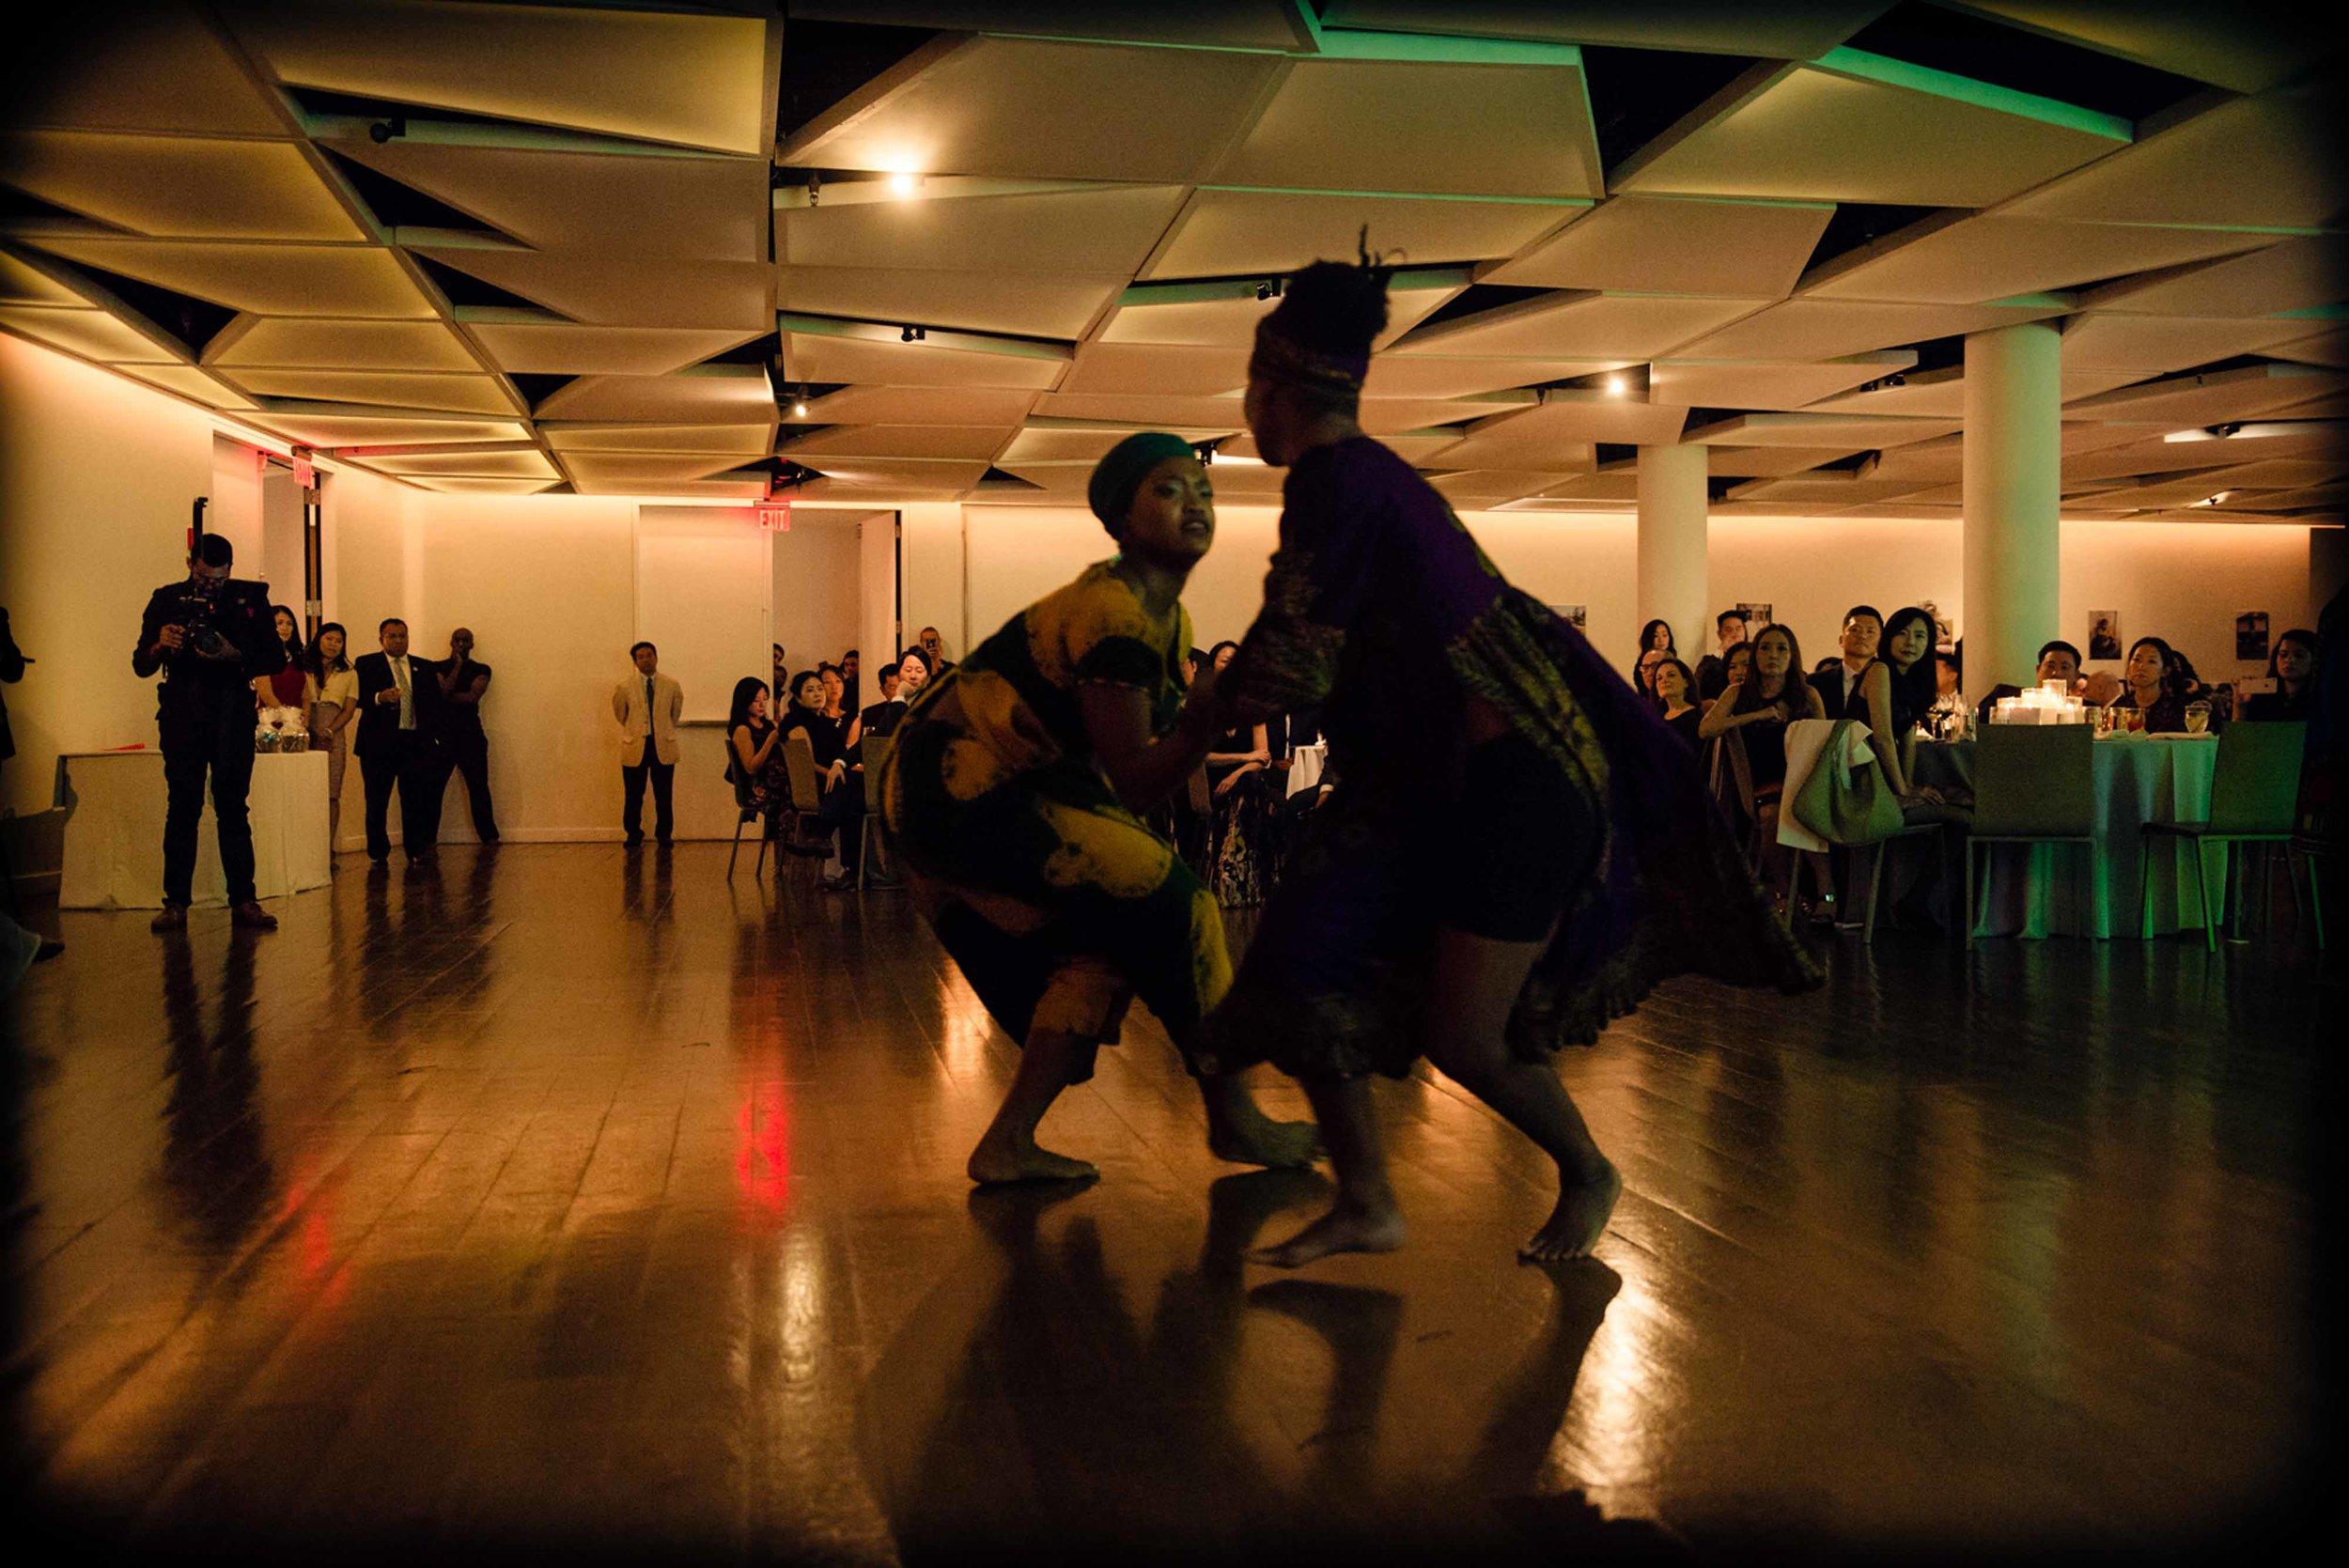 2017-10-21 Zimele USA 6th Annual Gala - Maritime Parc - Jersey City NJ_0263.jpg